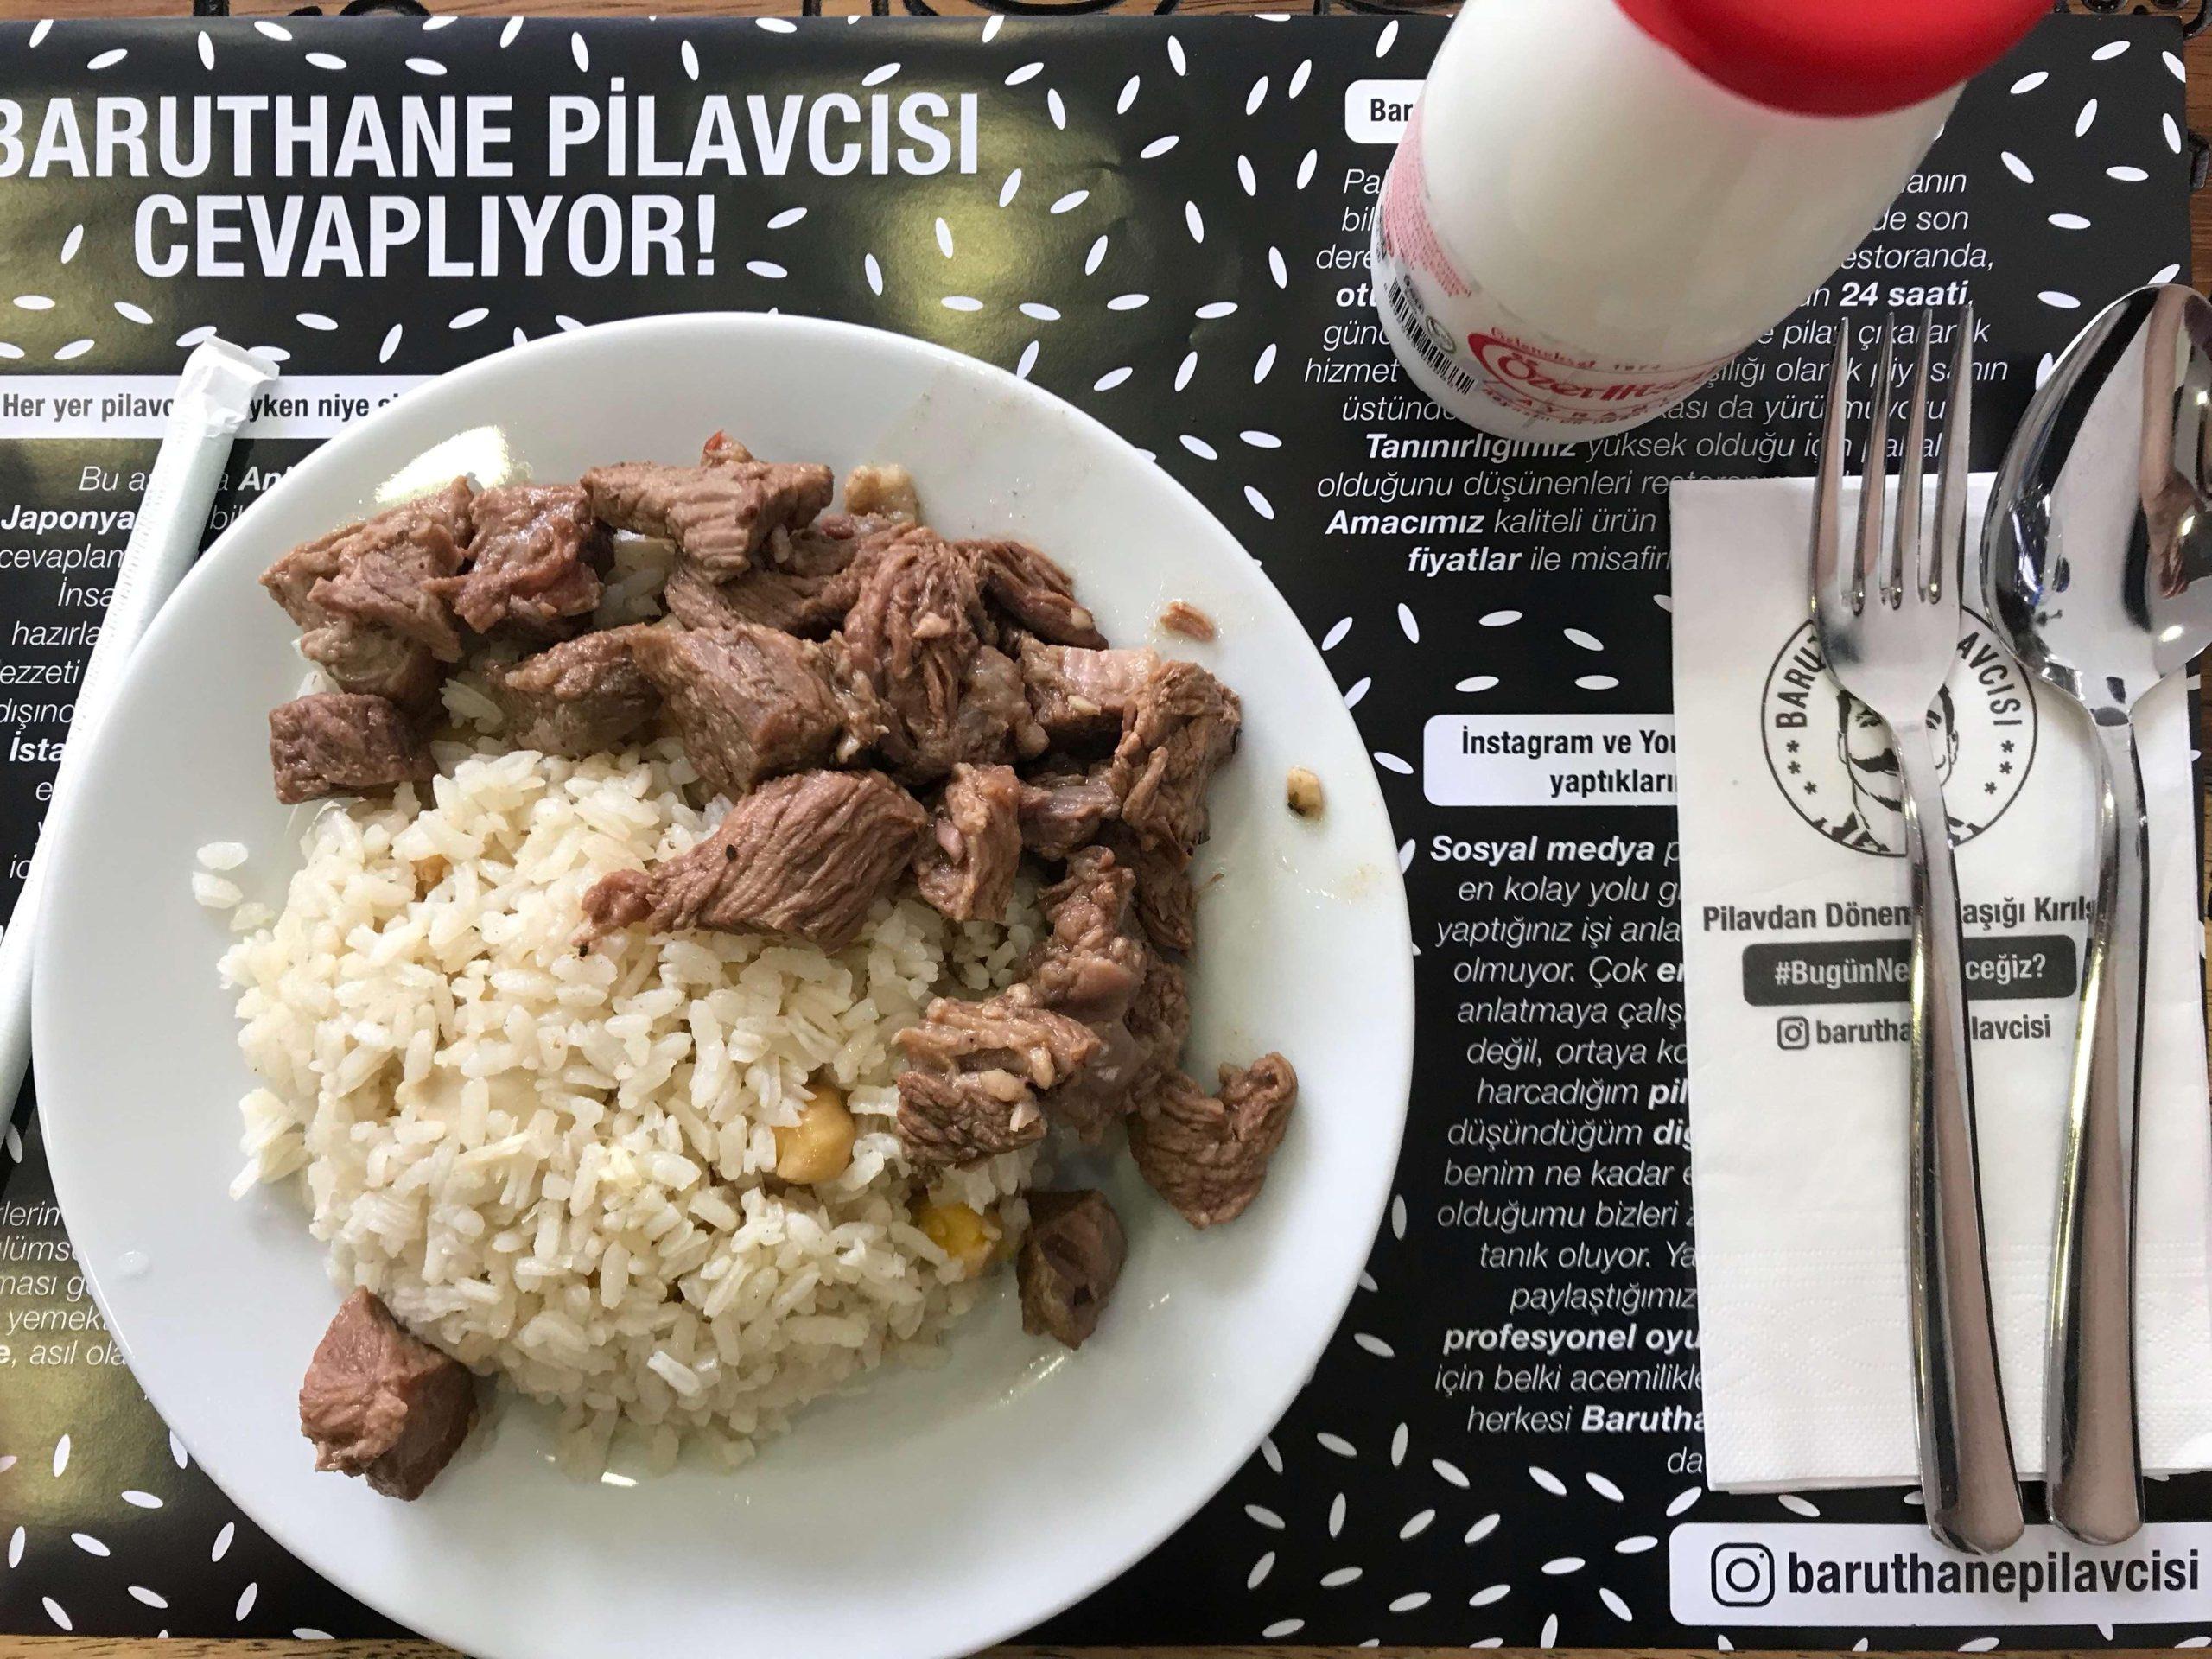 Baruthane Pilavcısı, İstanbul